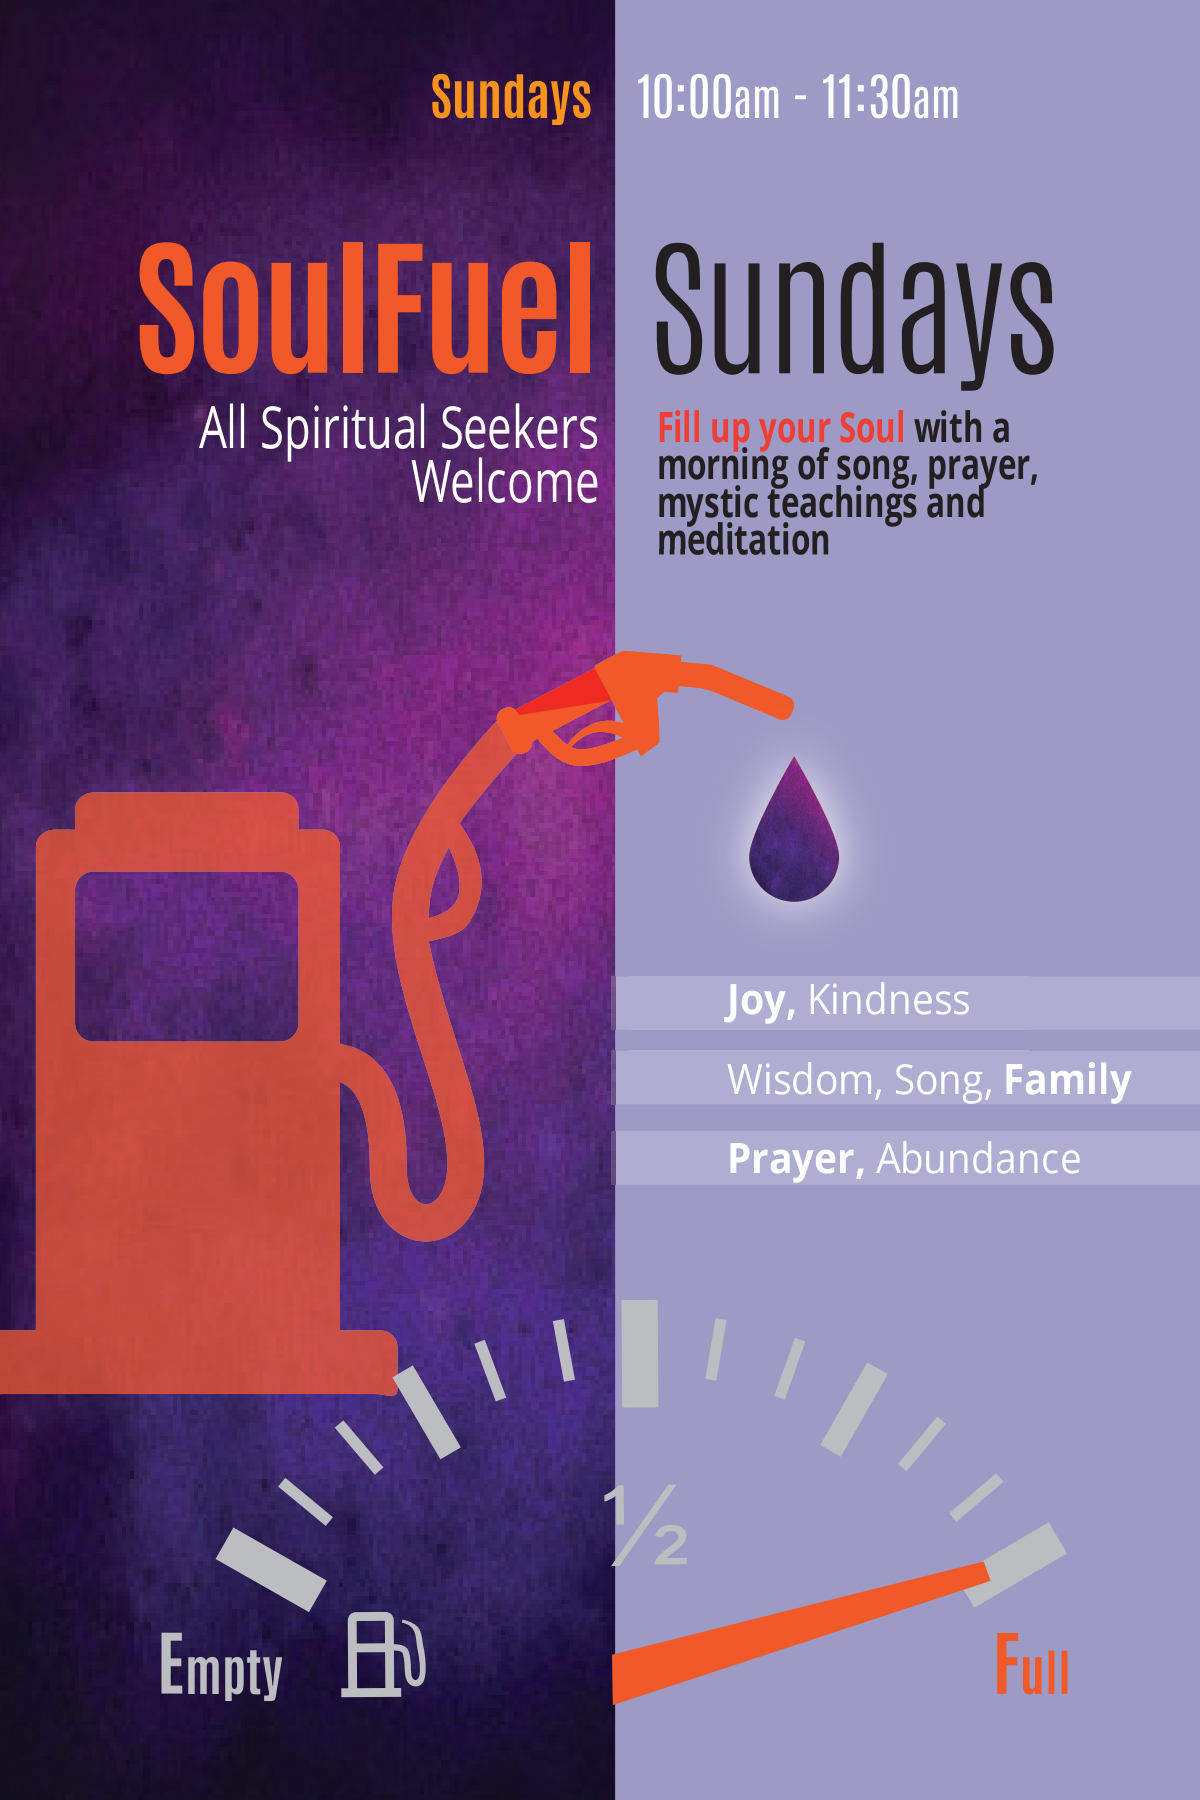 Soul Fuel Sundays Flyer